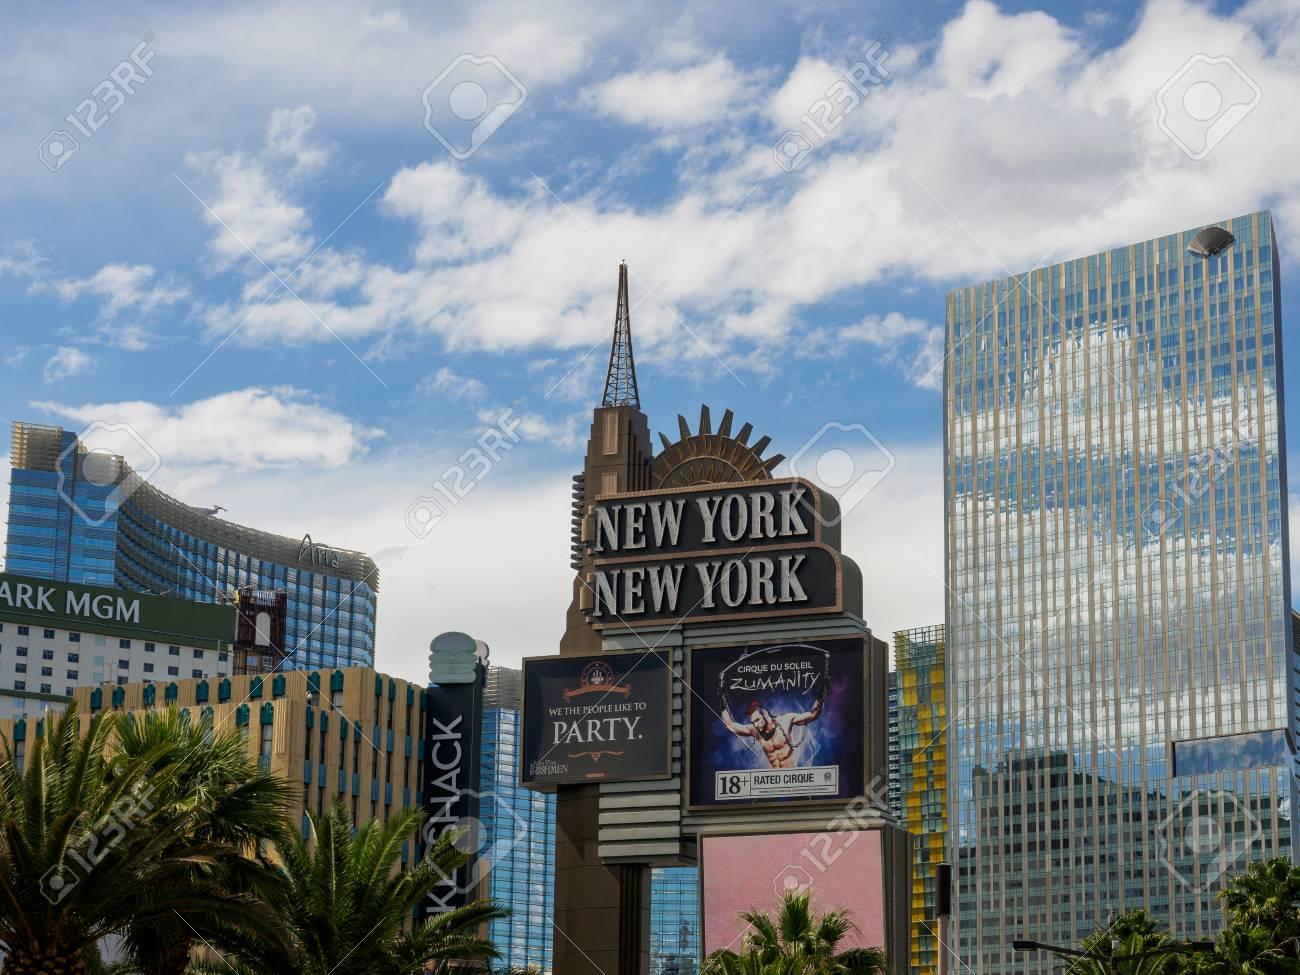 Las Vegas Nevada May 28 2018 New York New York Hotel Casino